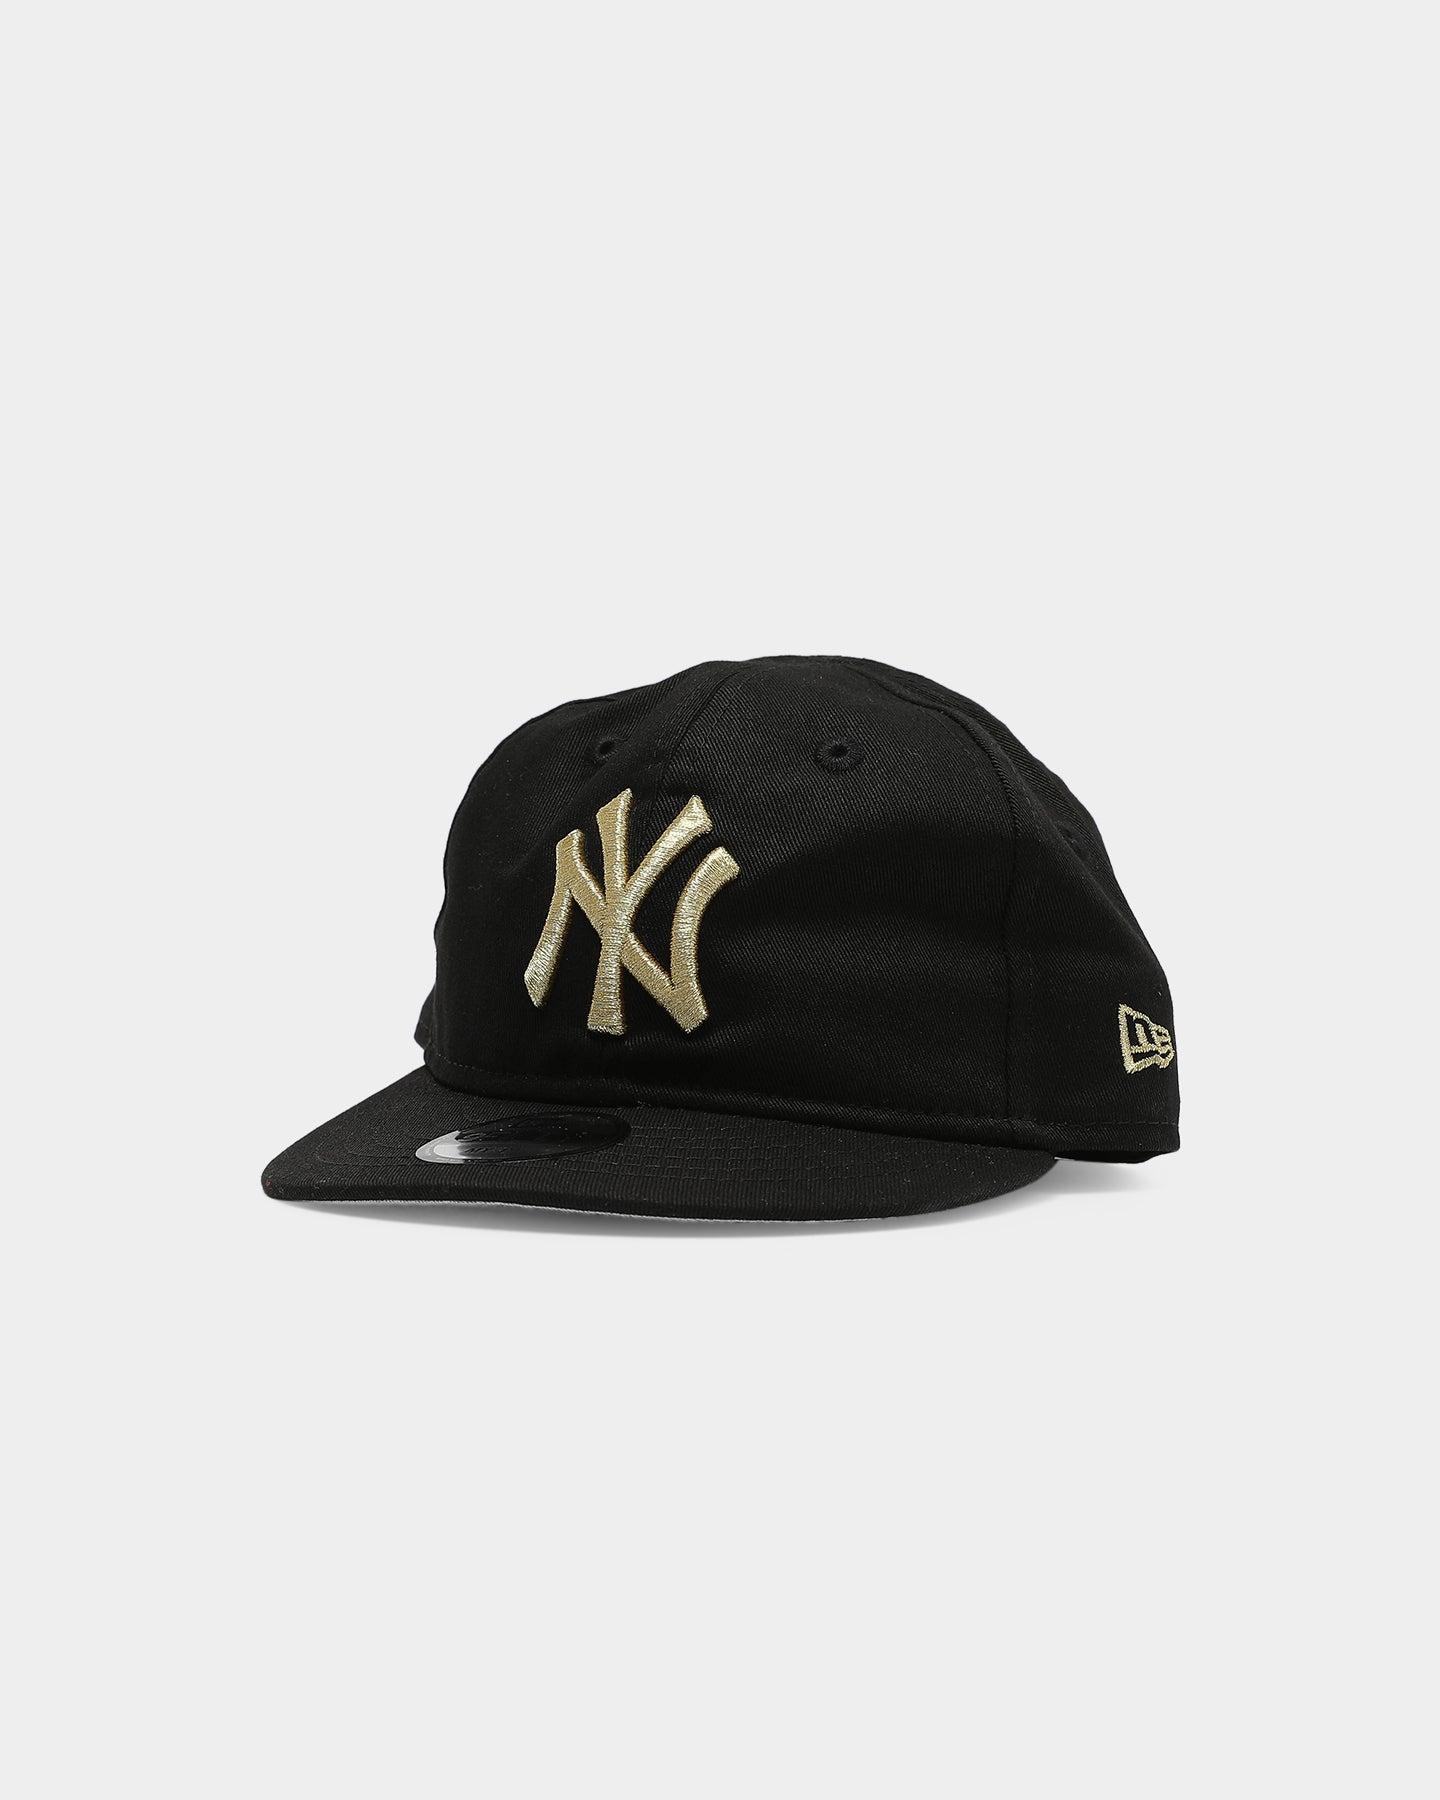 A NEW ERA Brooklyn Nets BLK Hoodie ohne Genre L Brooklyn nets blk